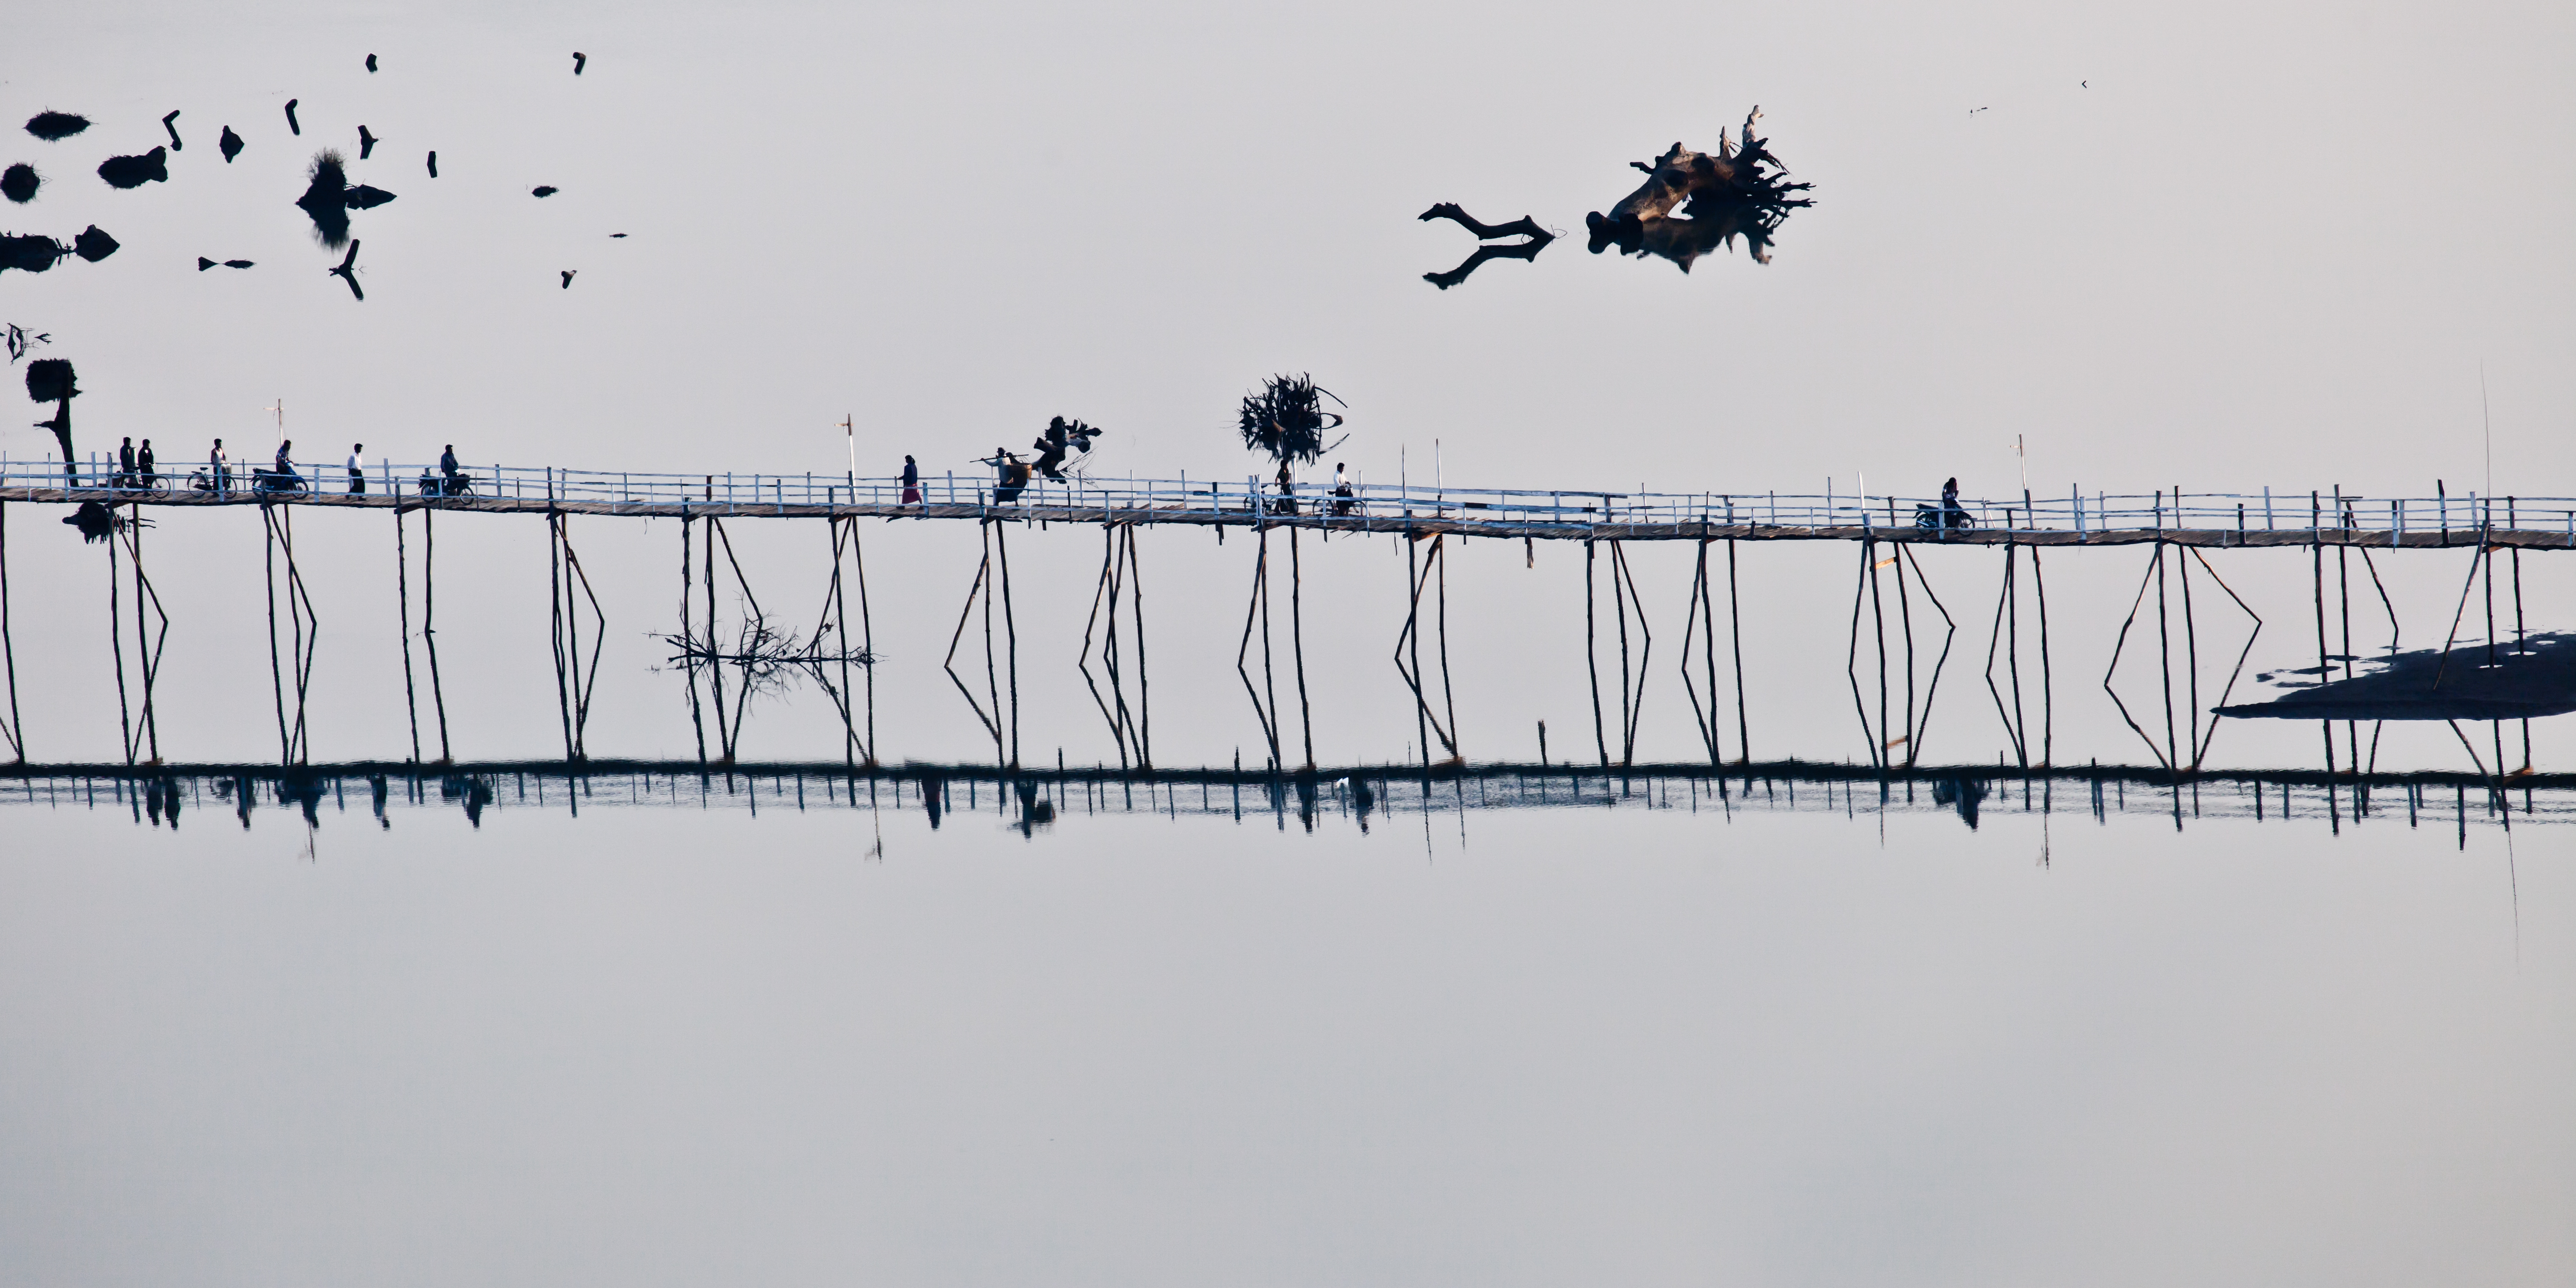 Thandwe, Myanmar